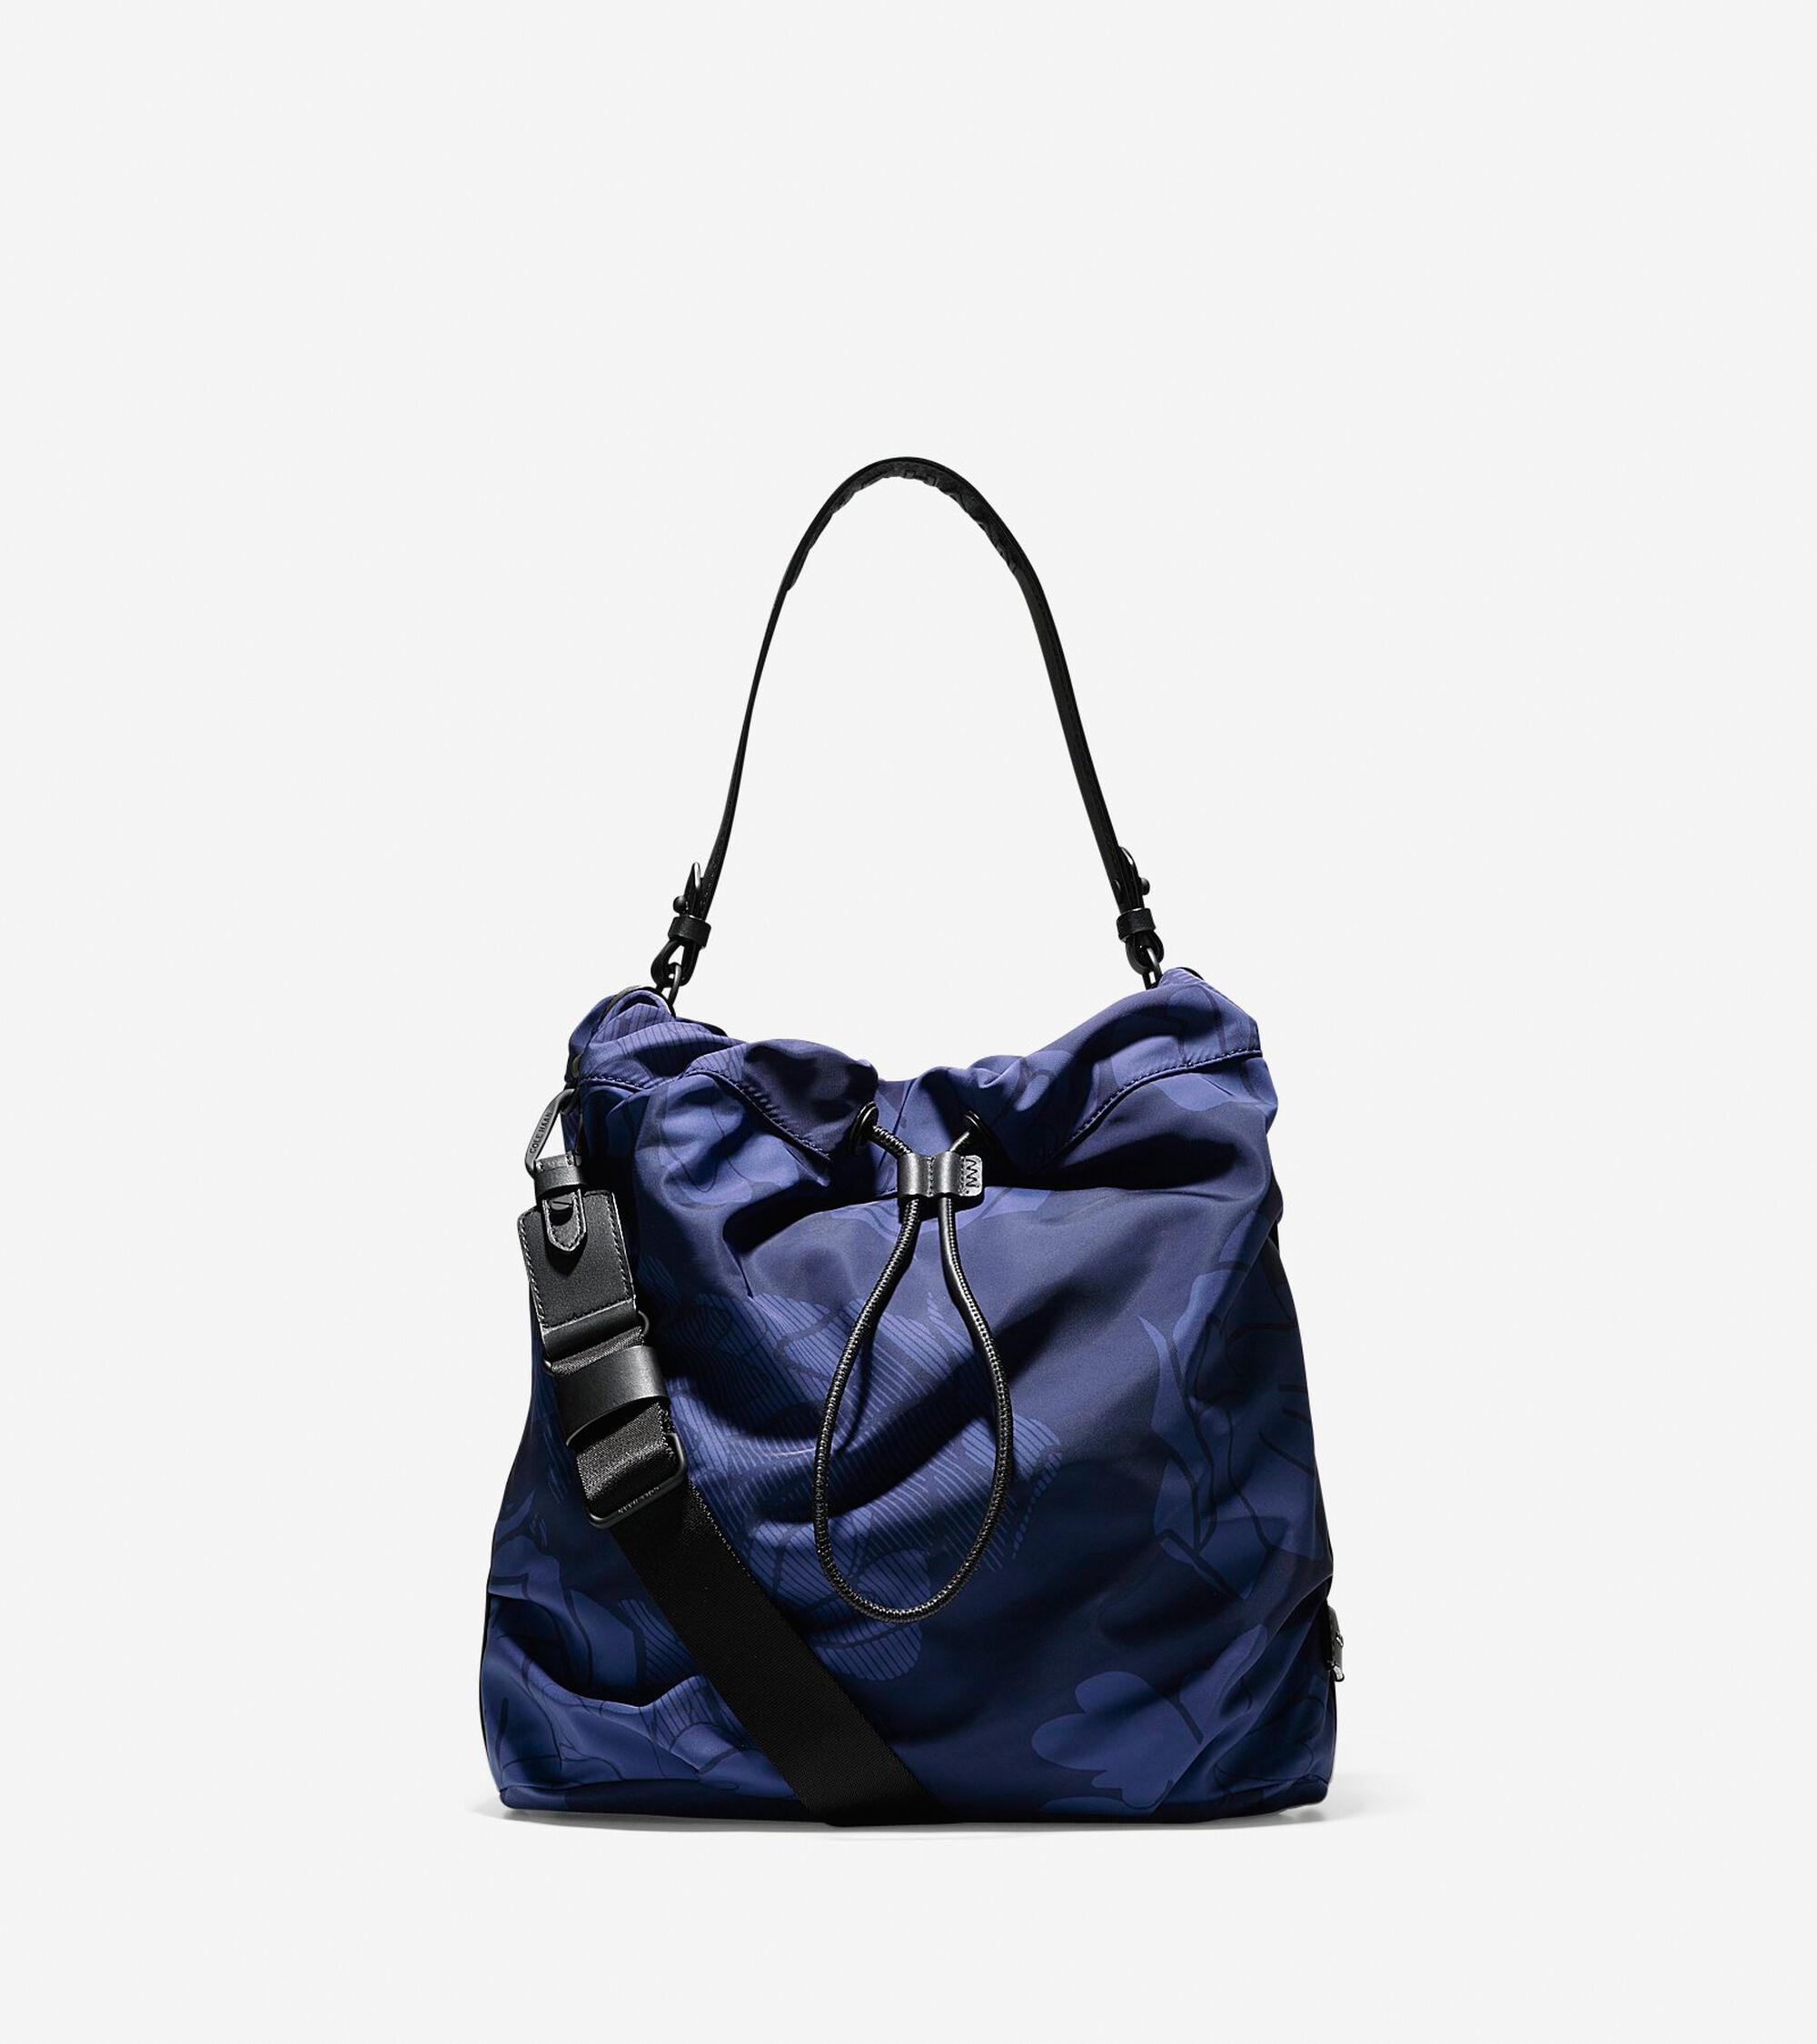 Totes > Stagedoor Small Studio Bag